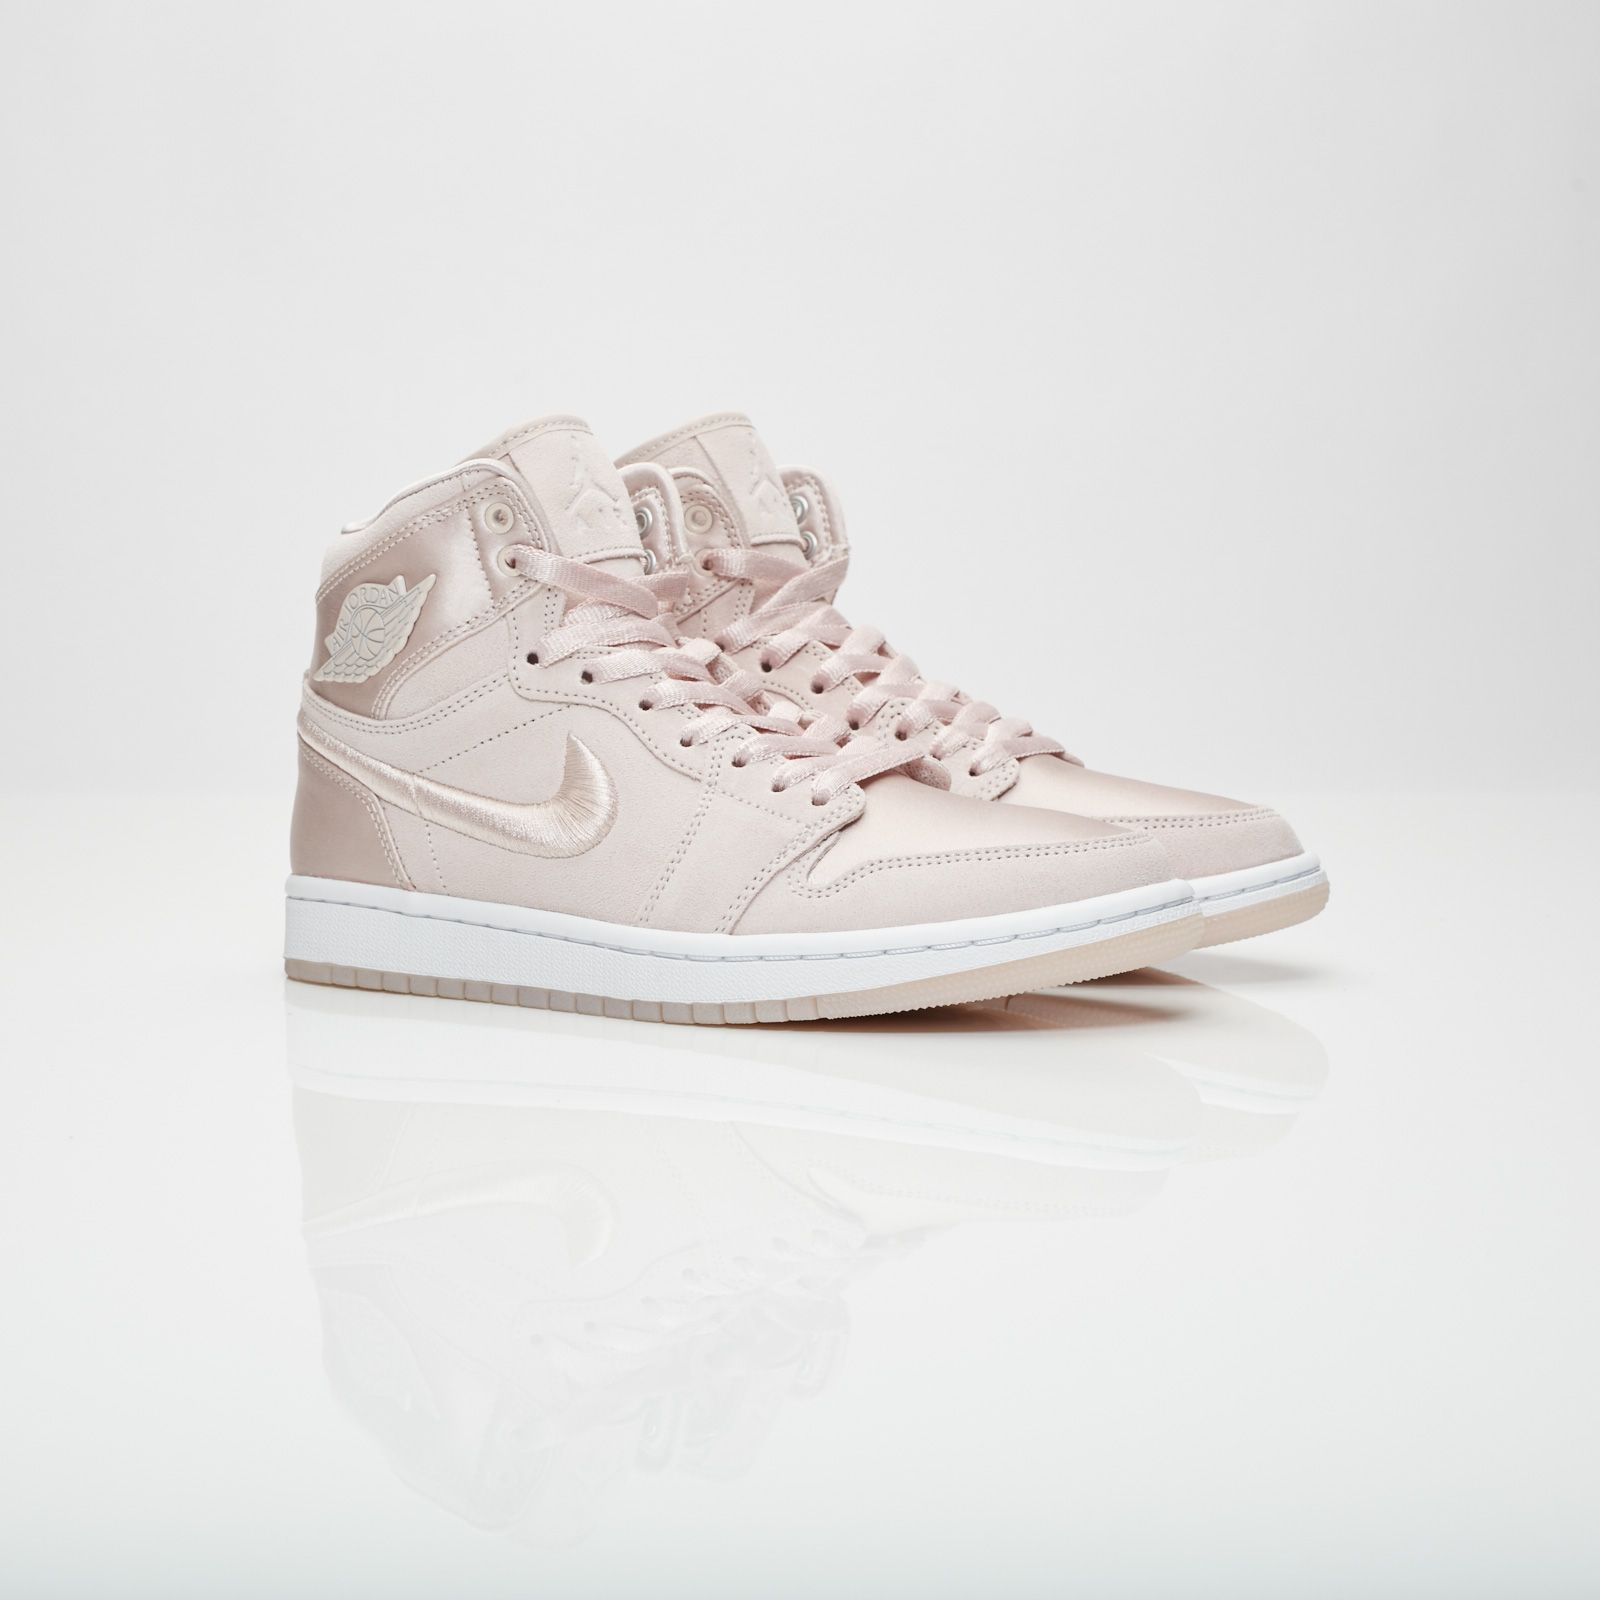 size 40 e02fe 7ffbf Jordan Brand Wmns Air Jordan 1 Retro High SOH